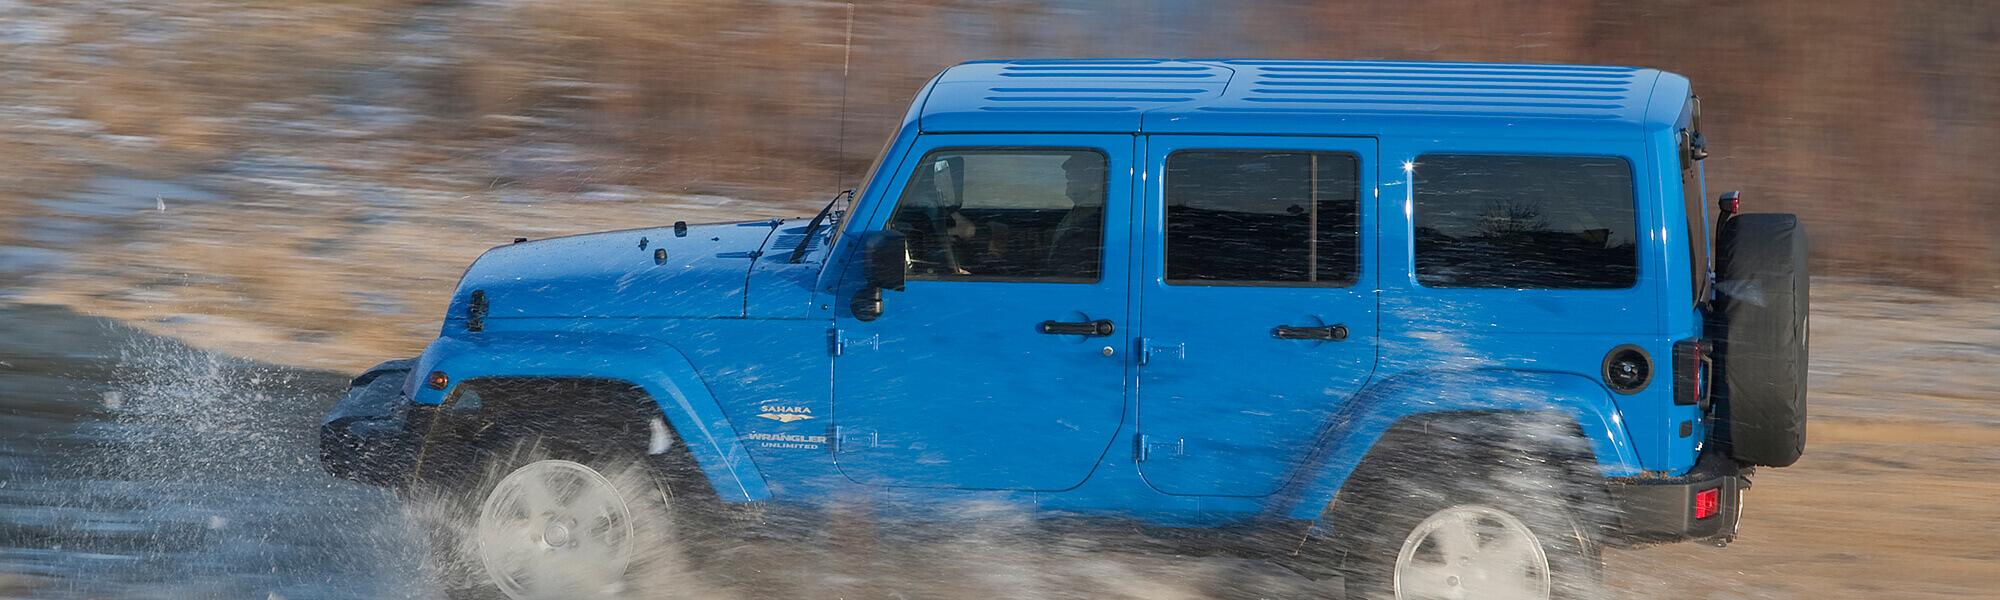 ulmen-jeep-wrngler-unlimited-slider-5